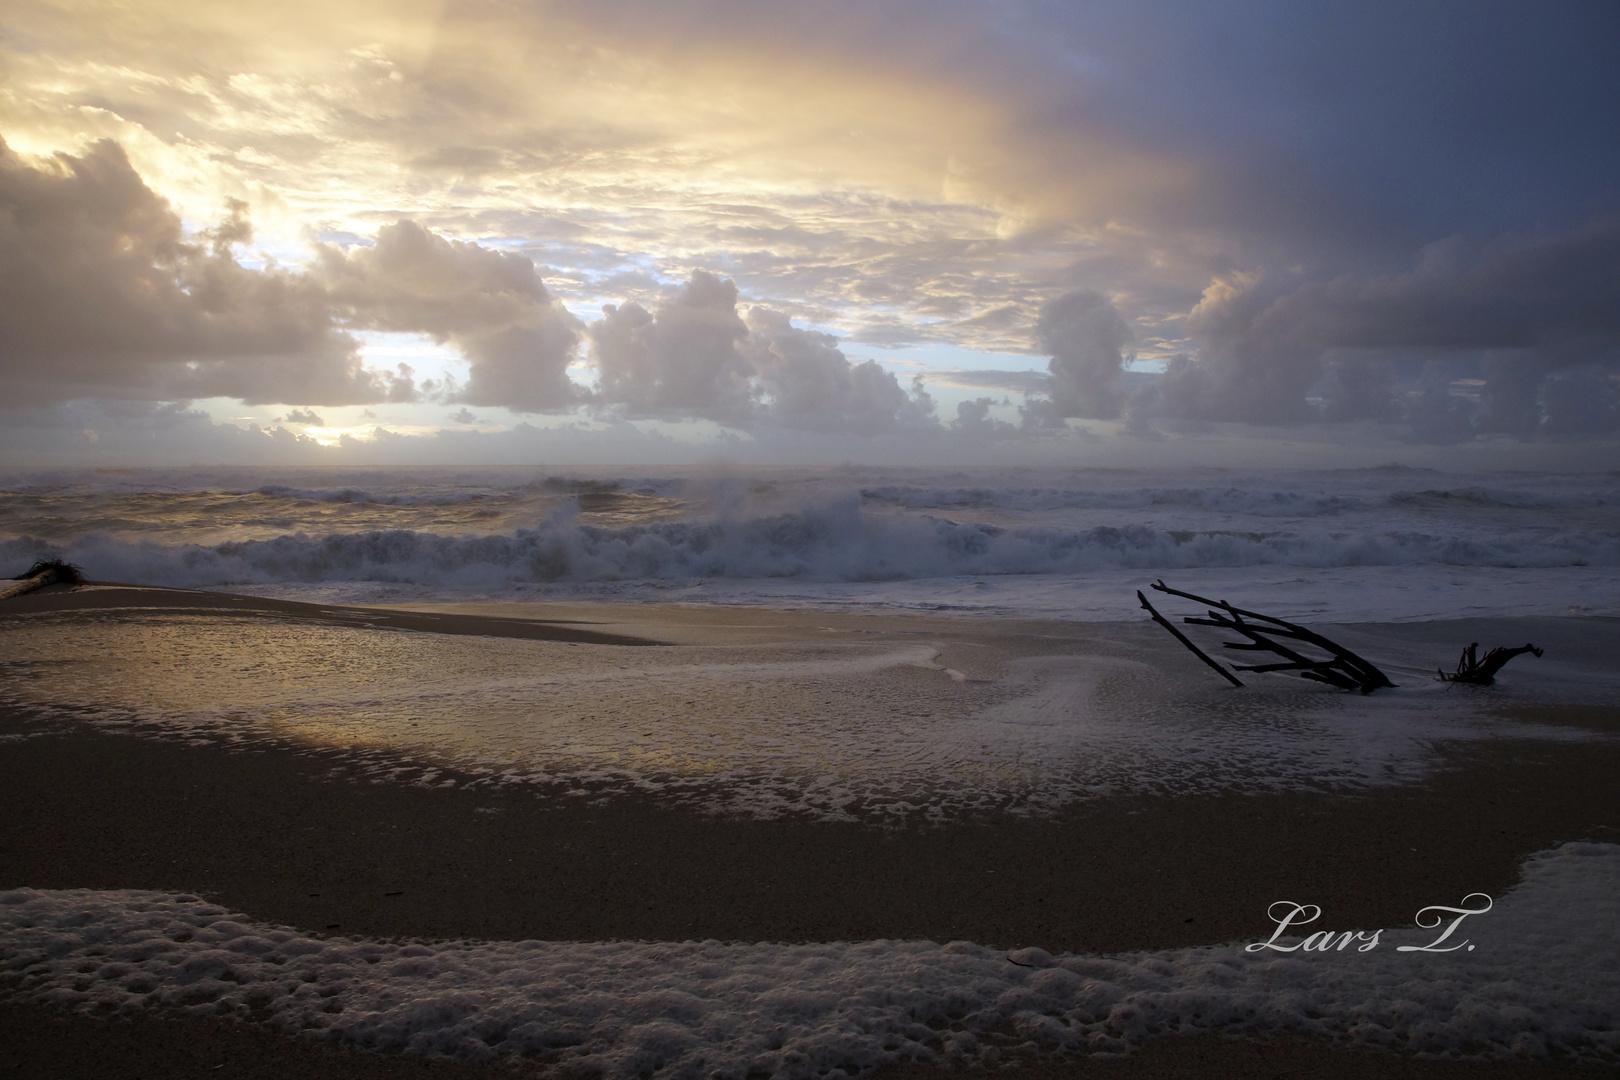 Tasman Sea - Waves in the Evening